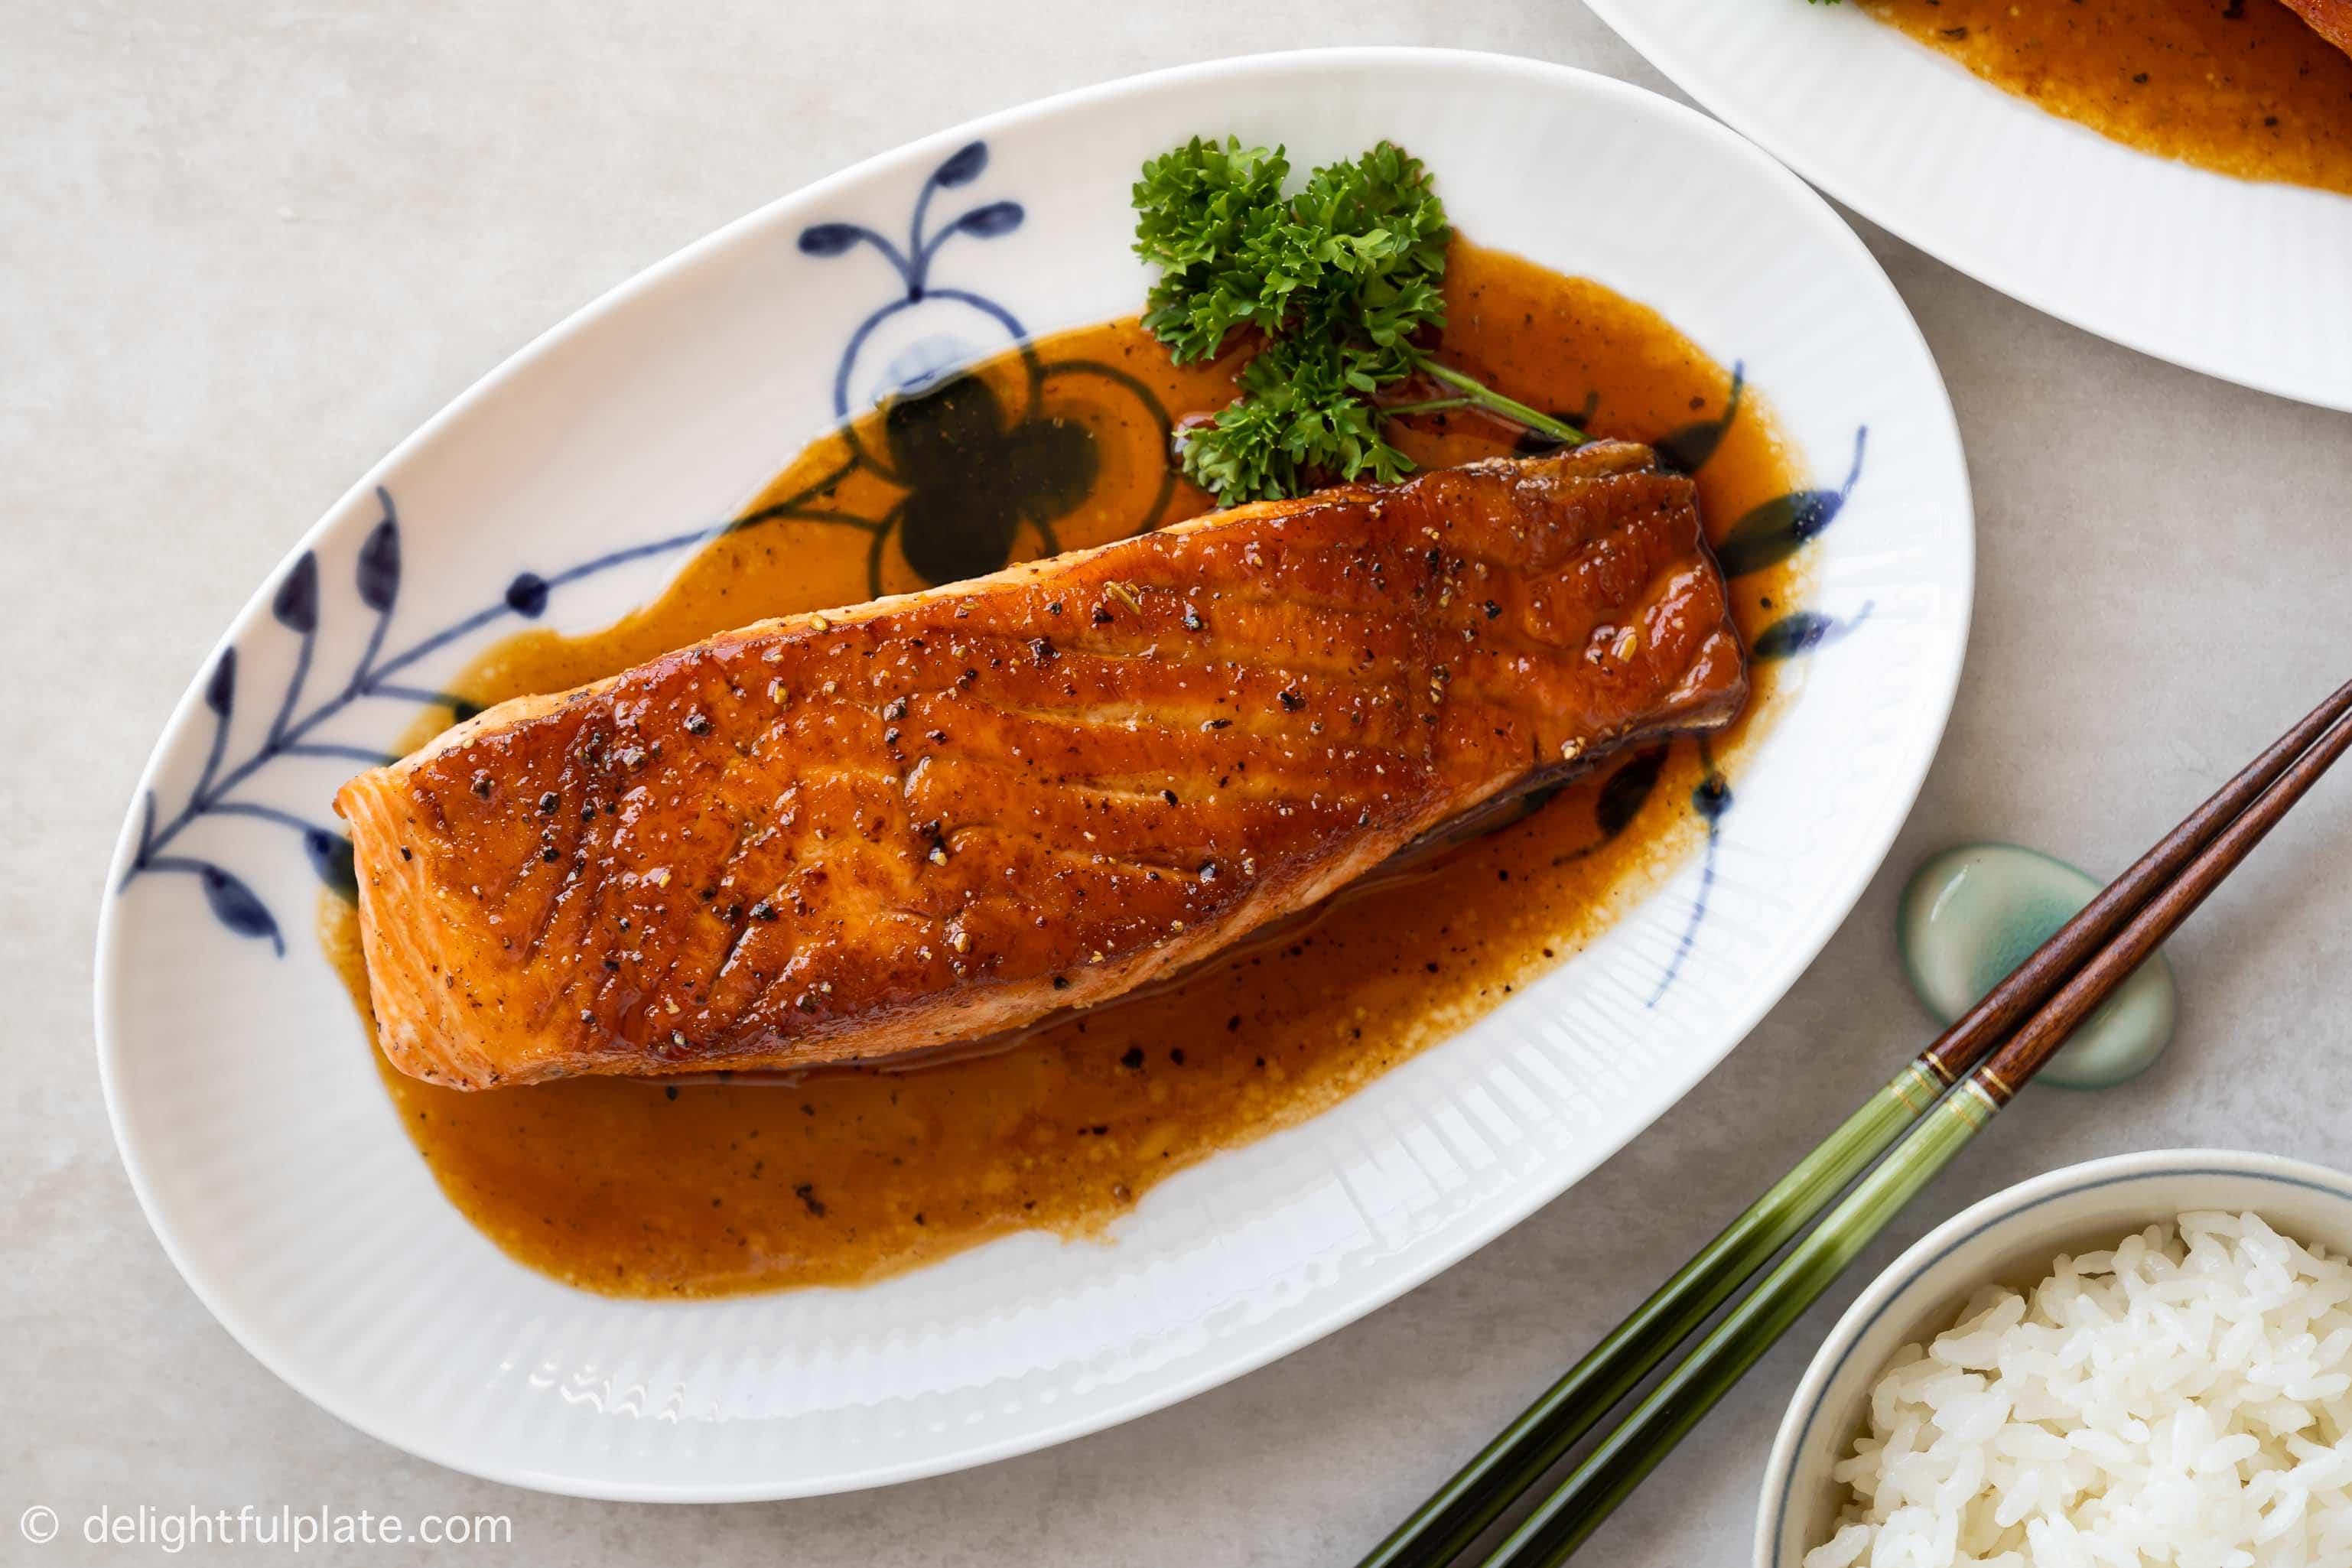 glazed salmon fillet on a serving plate